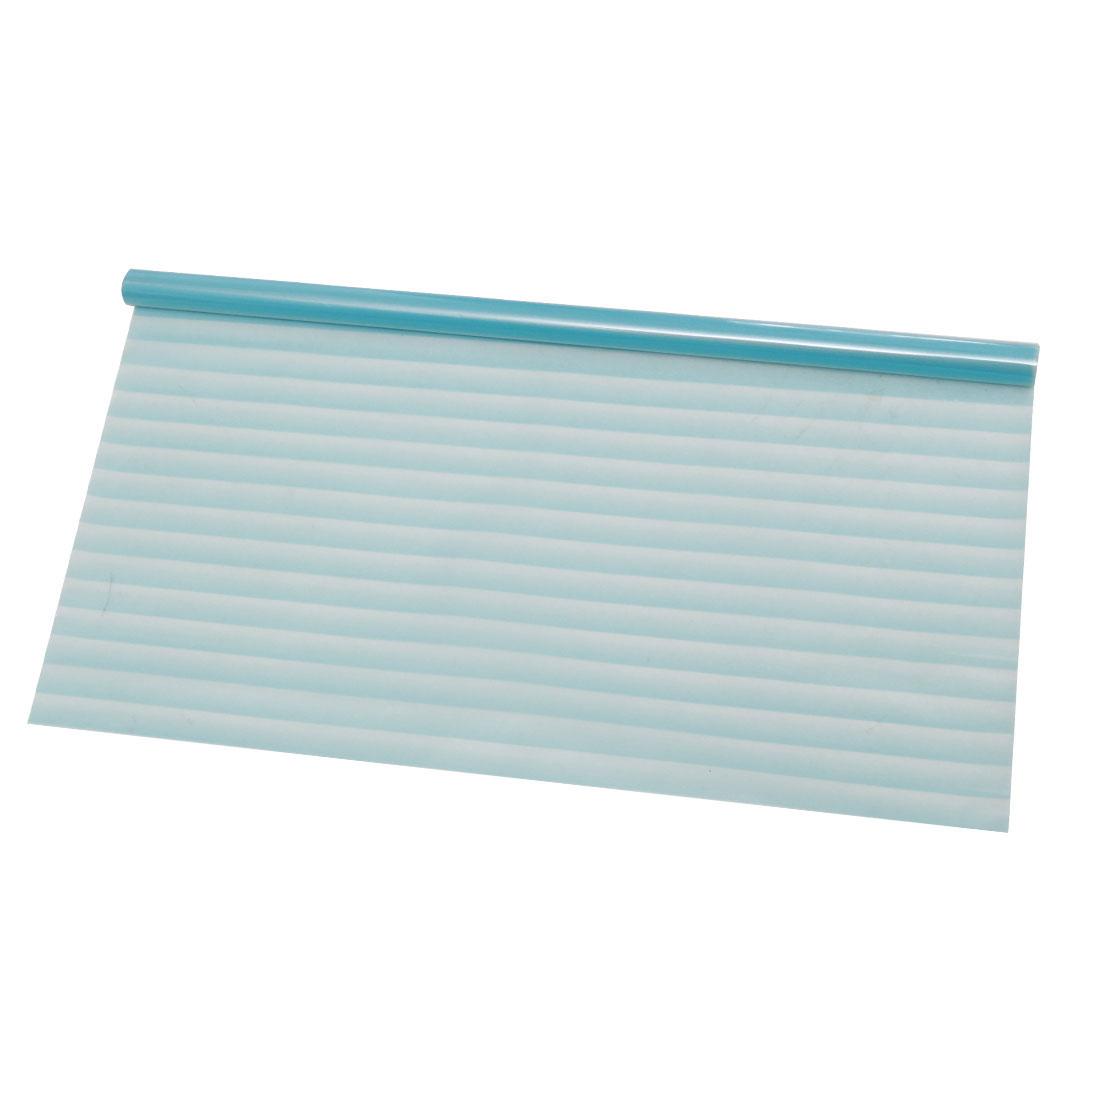 PVC 23.6 x 78.7 Inch Privacy Anti UV Glass Window Film Sticker Solid Blue